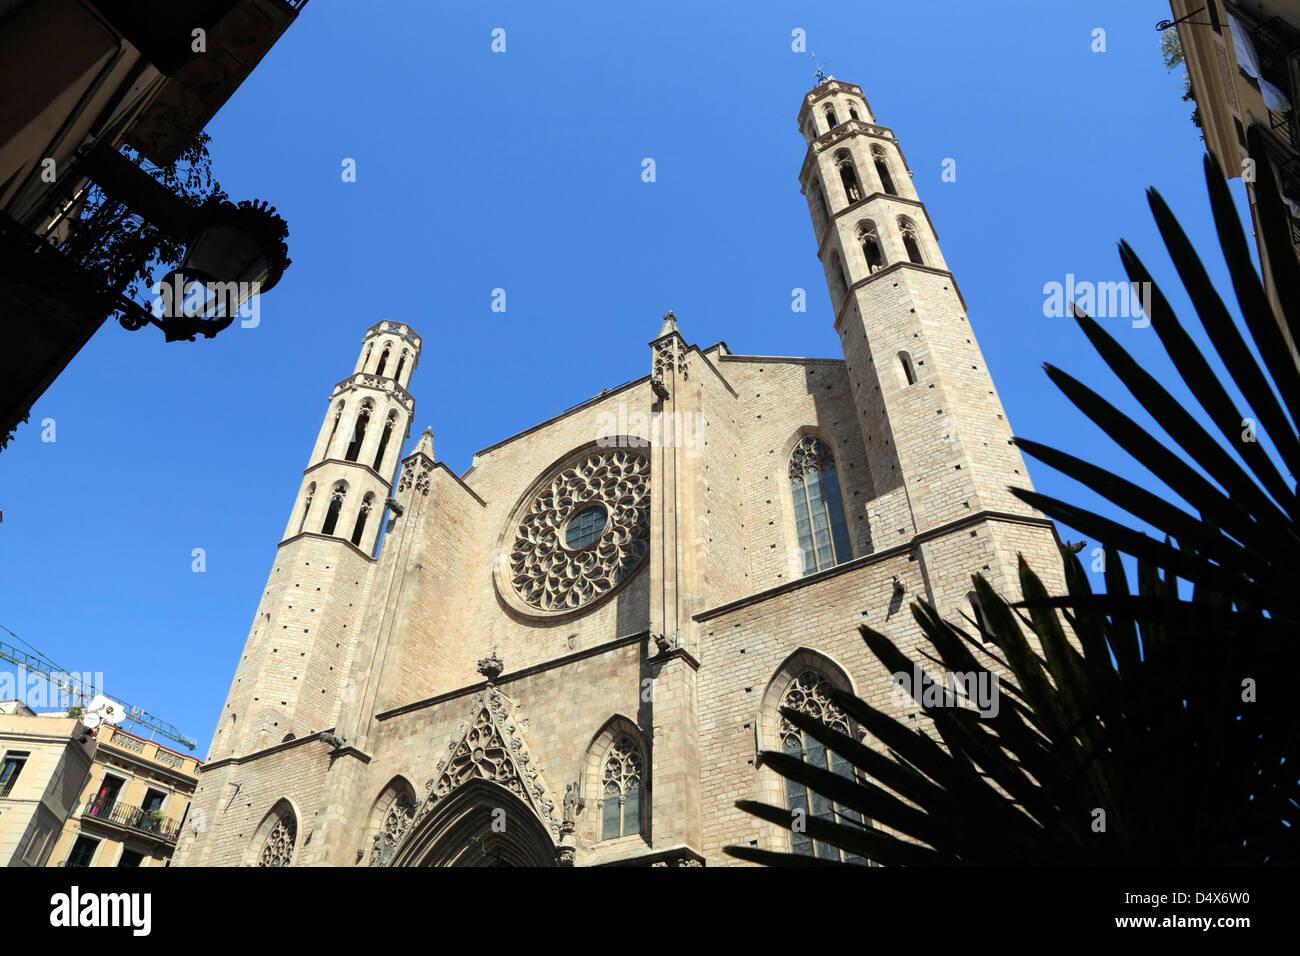 Ribera Quarter, Church Santa Maria del Mar, Barcelona, Spain - Stock Image